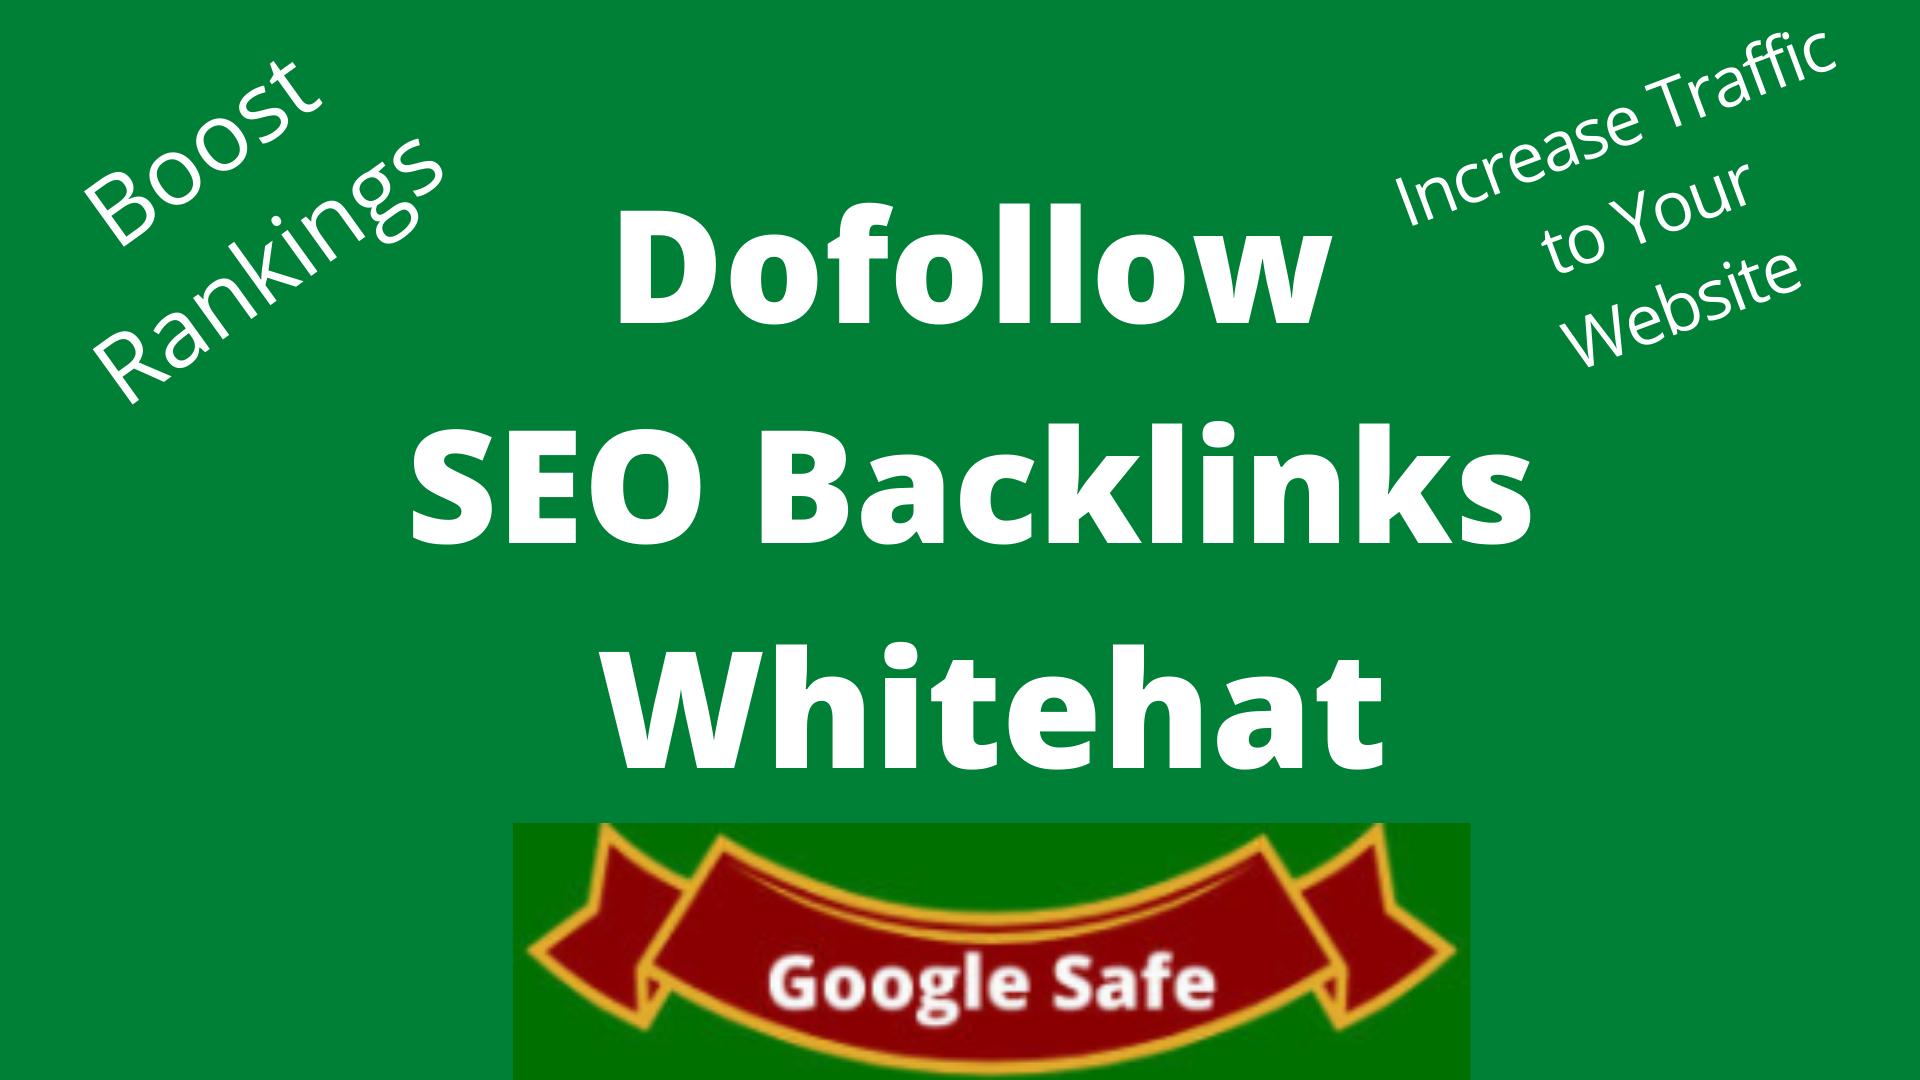 I create High Quality Dofollow SEO Backlinks for Google Top Ranking